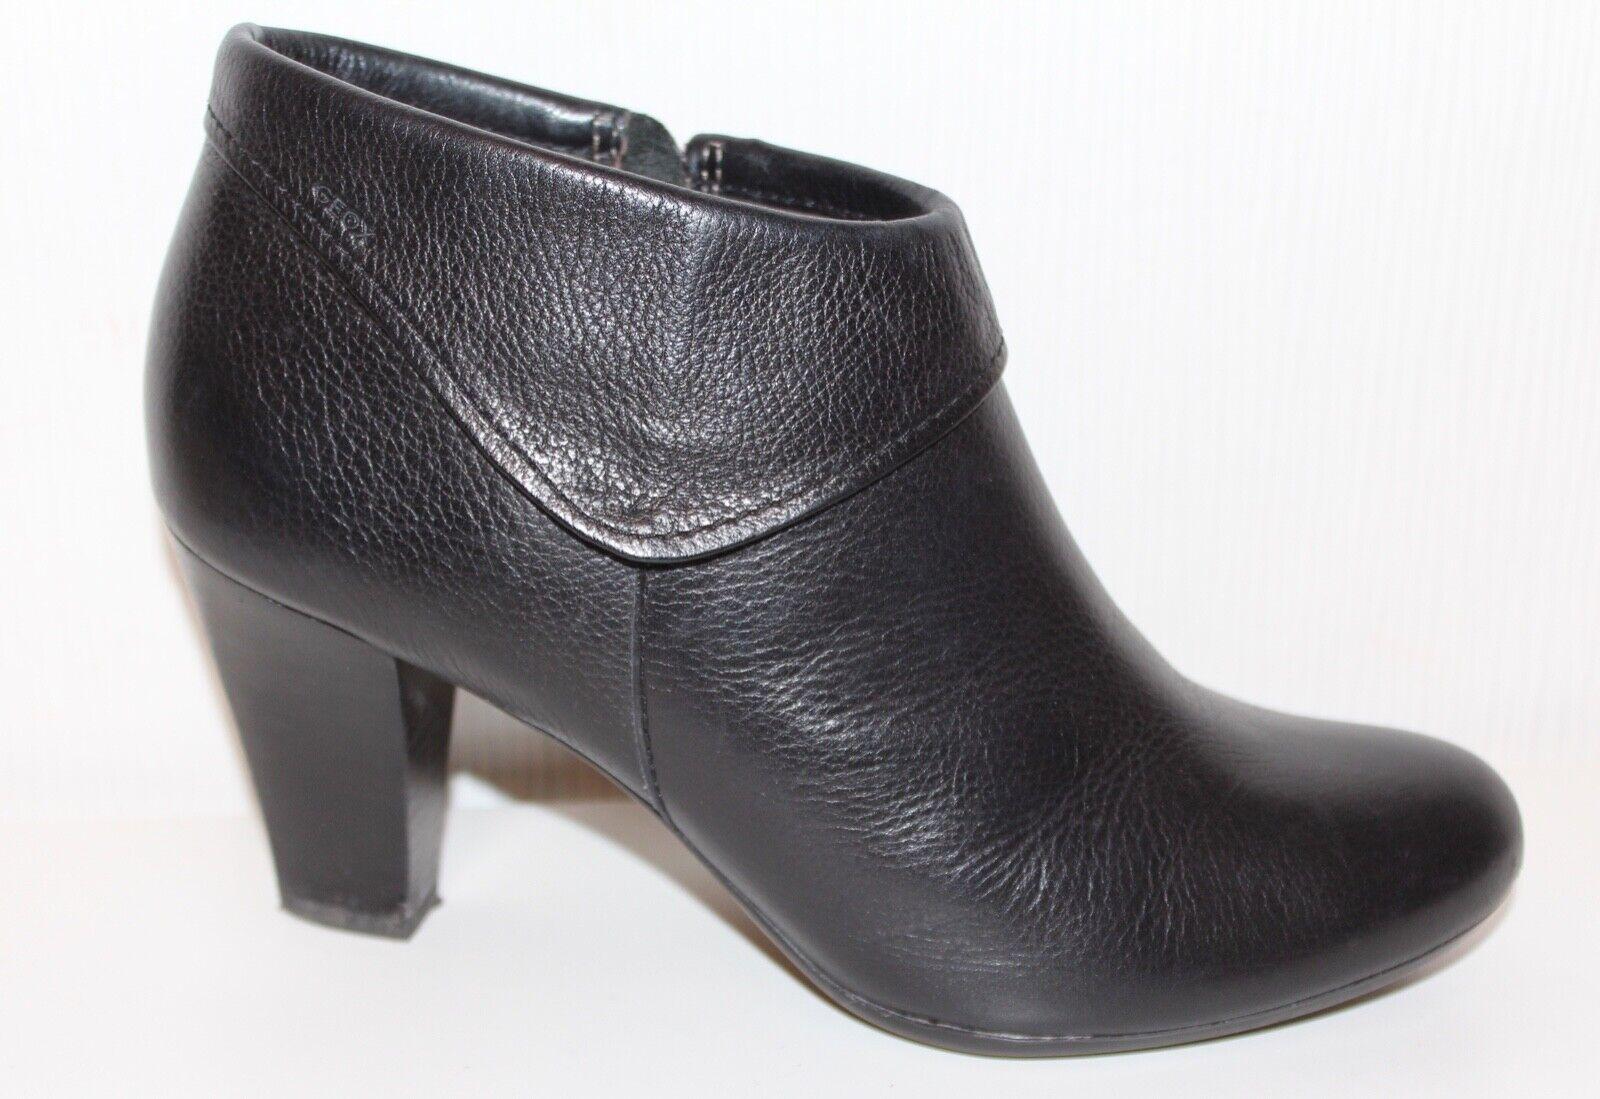 GEOX LEDER STIEFELETTEN High HEEL Ankle Chelsea Pistol Stiefel 38 StiefelIES STIEFEL